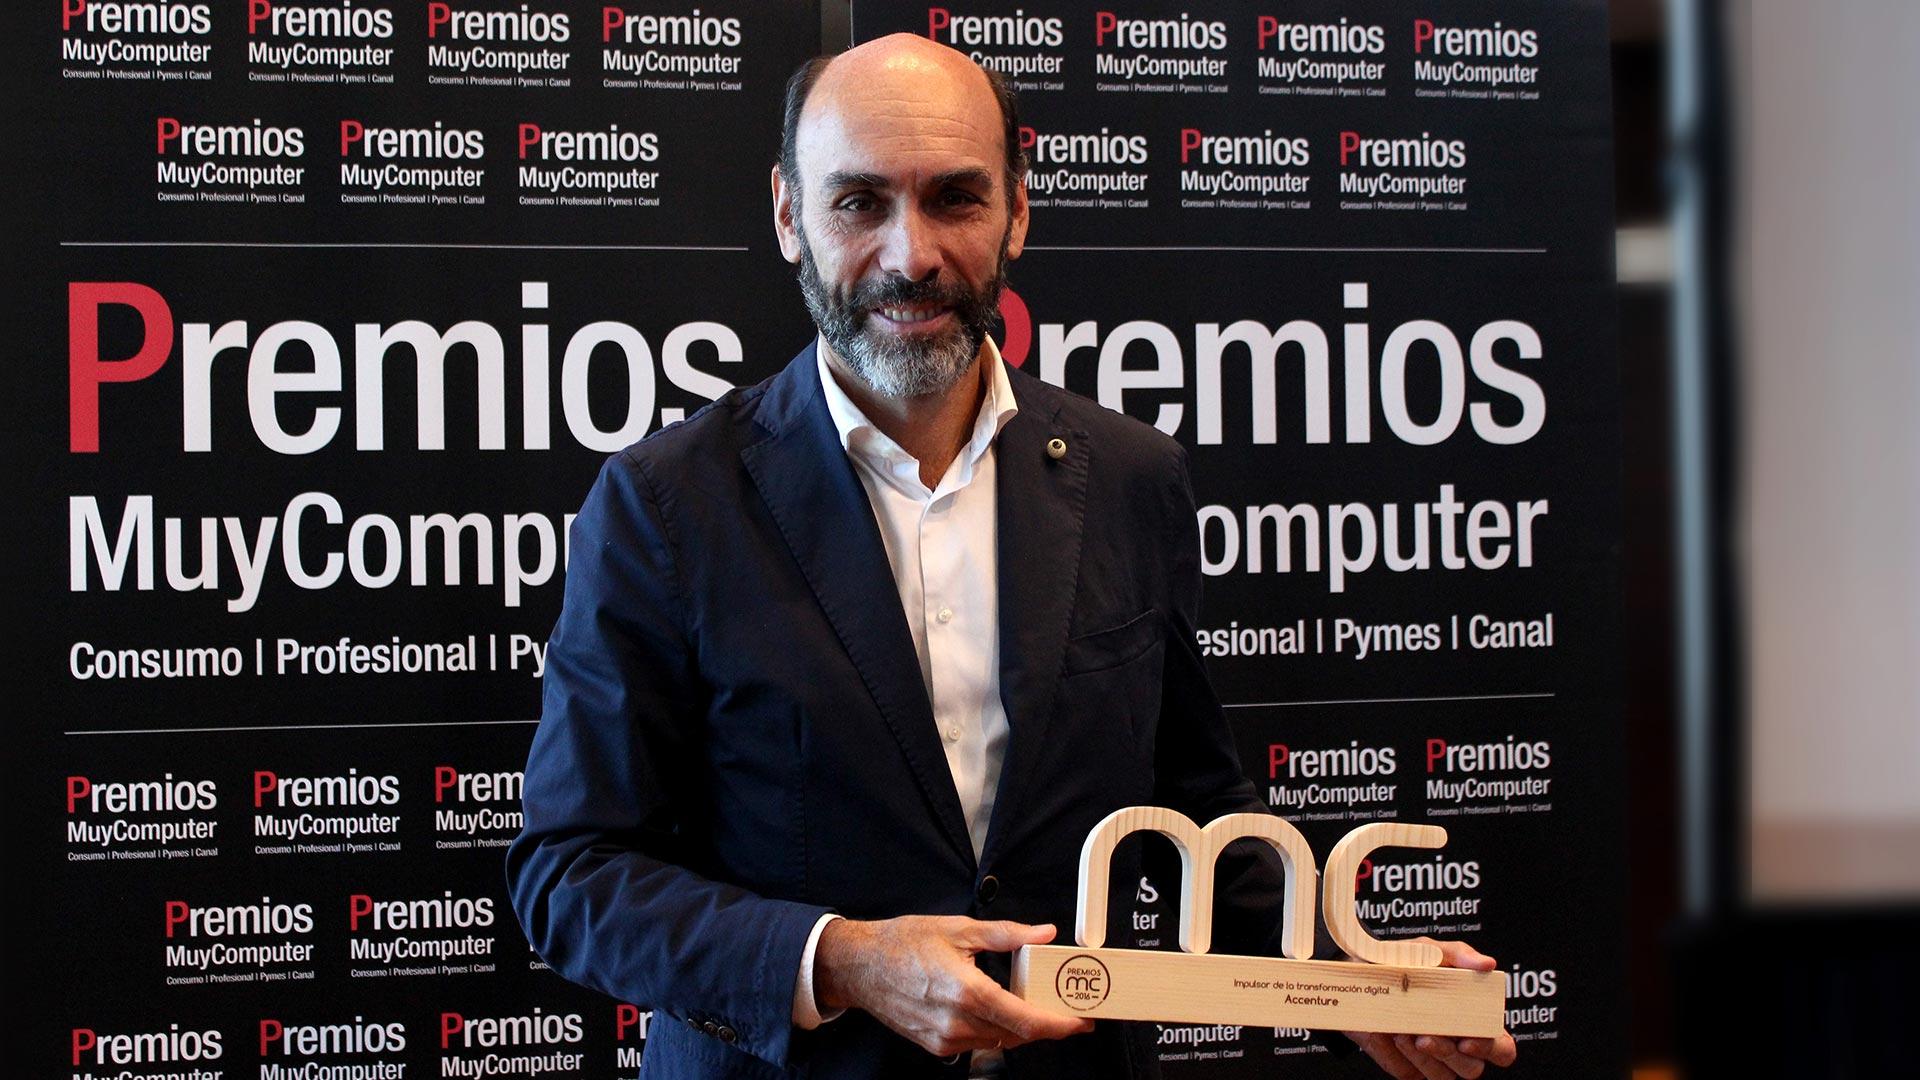 premiosmc2016-impulsor-transformacion-digital-accenture